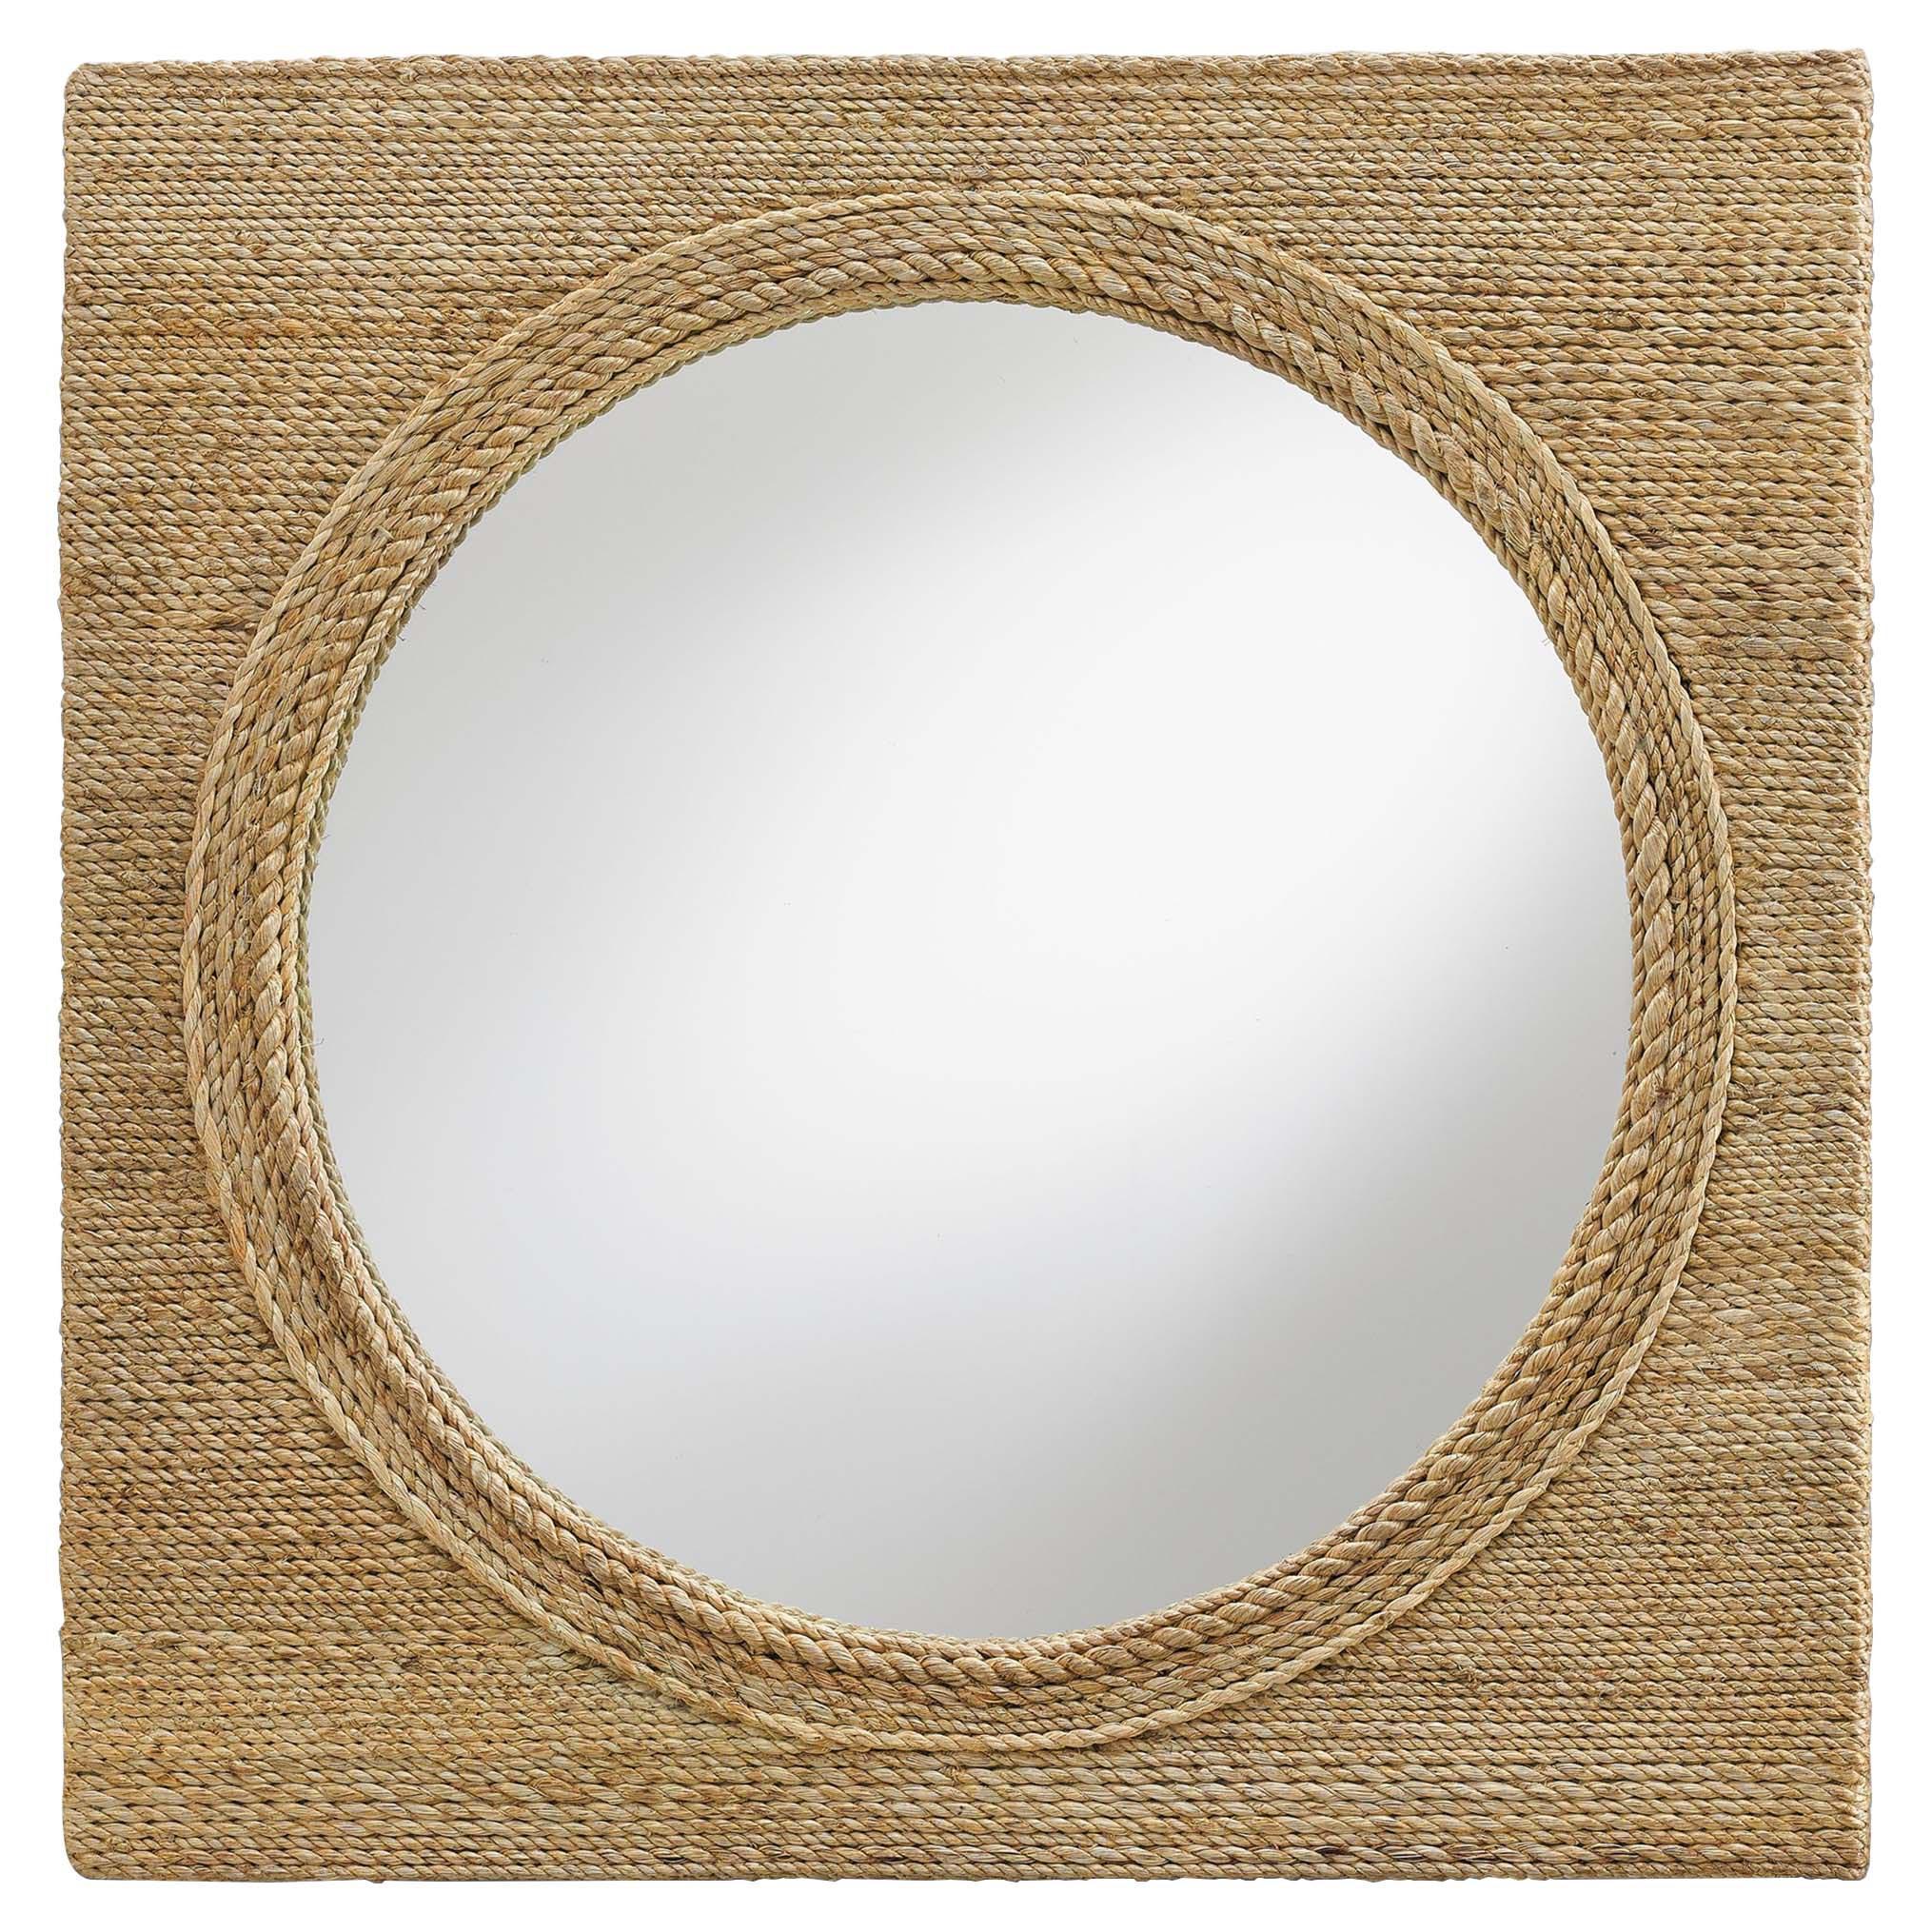 Sidra Coastal Beach Square Rope Wrapped Porthole Mirror